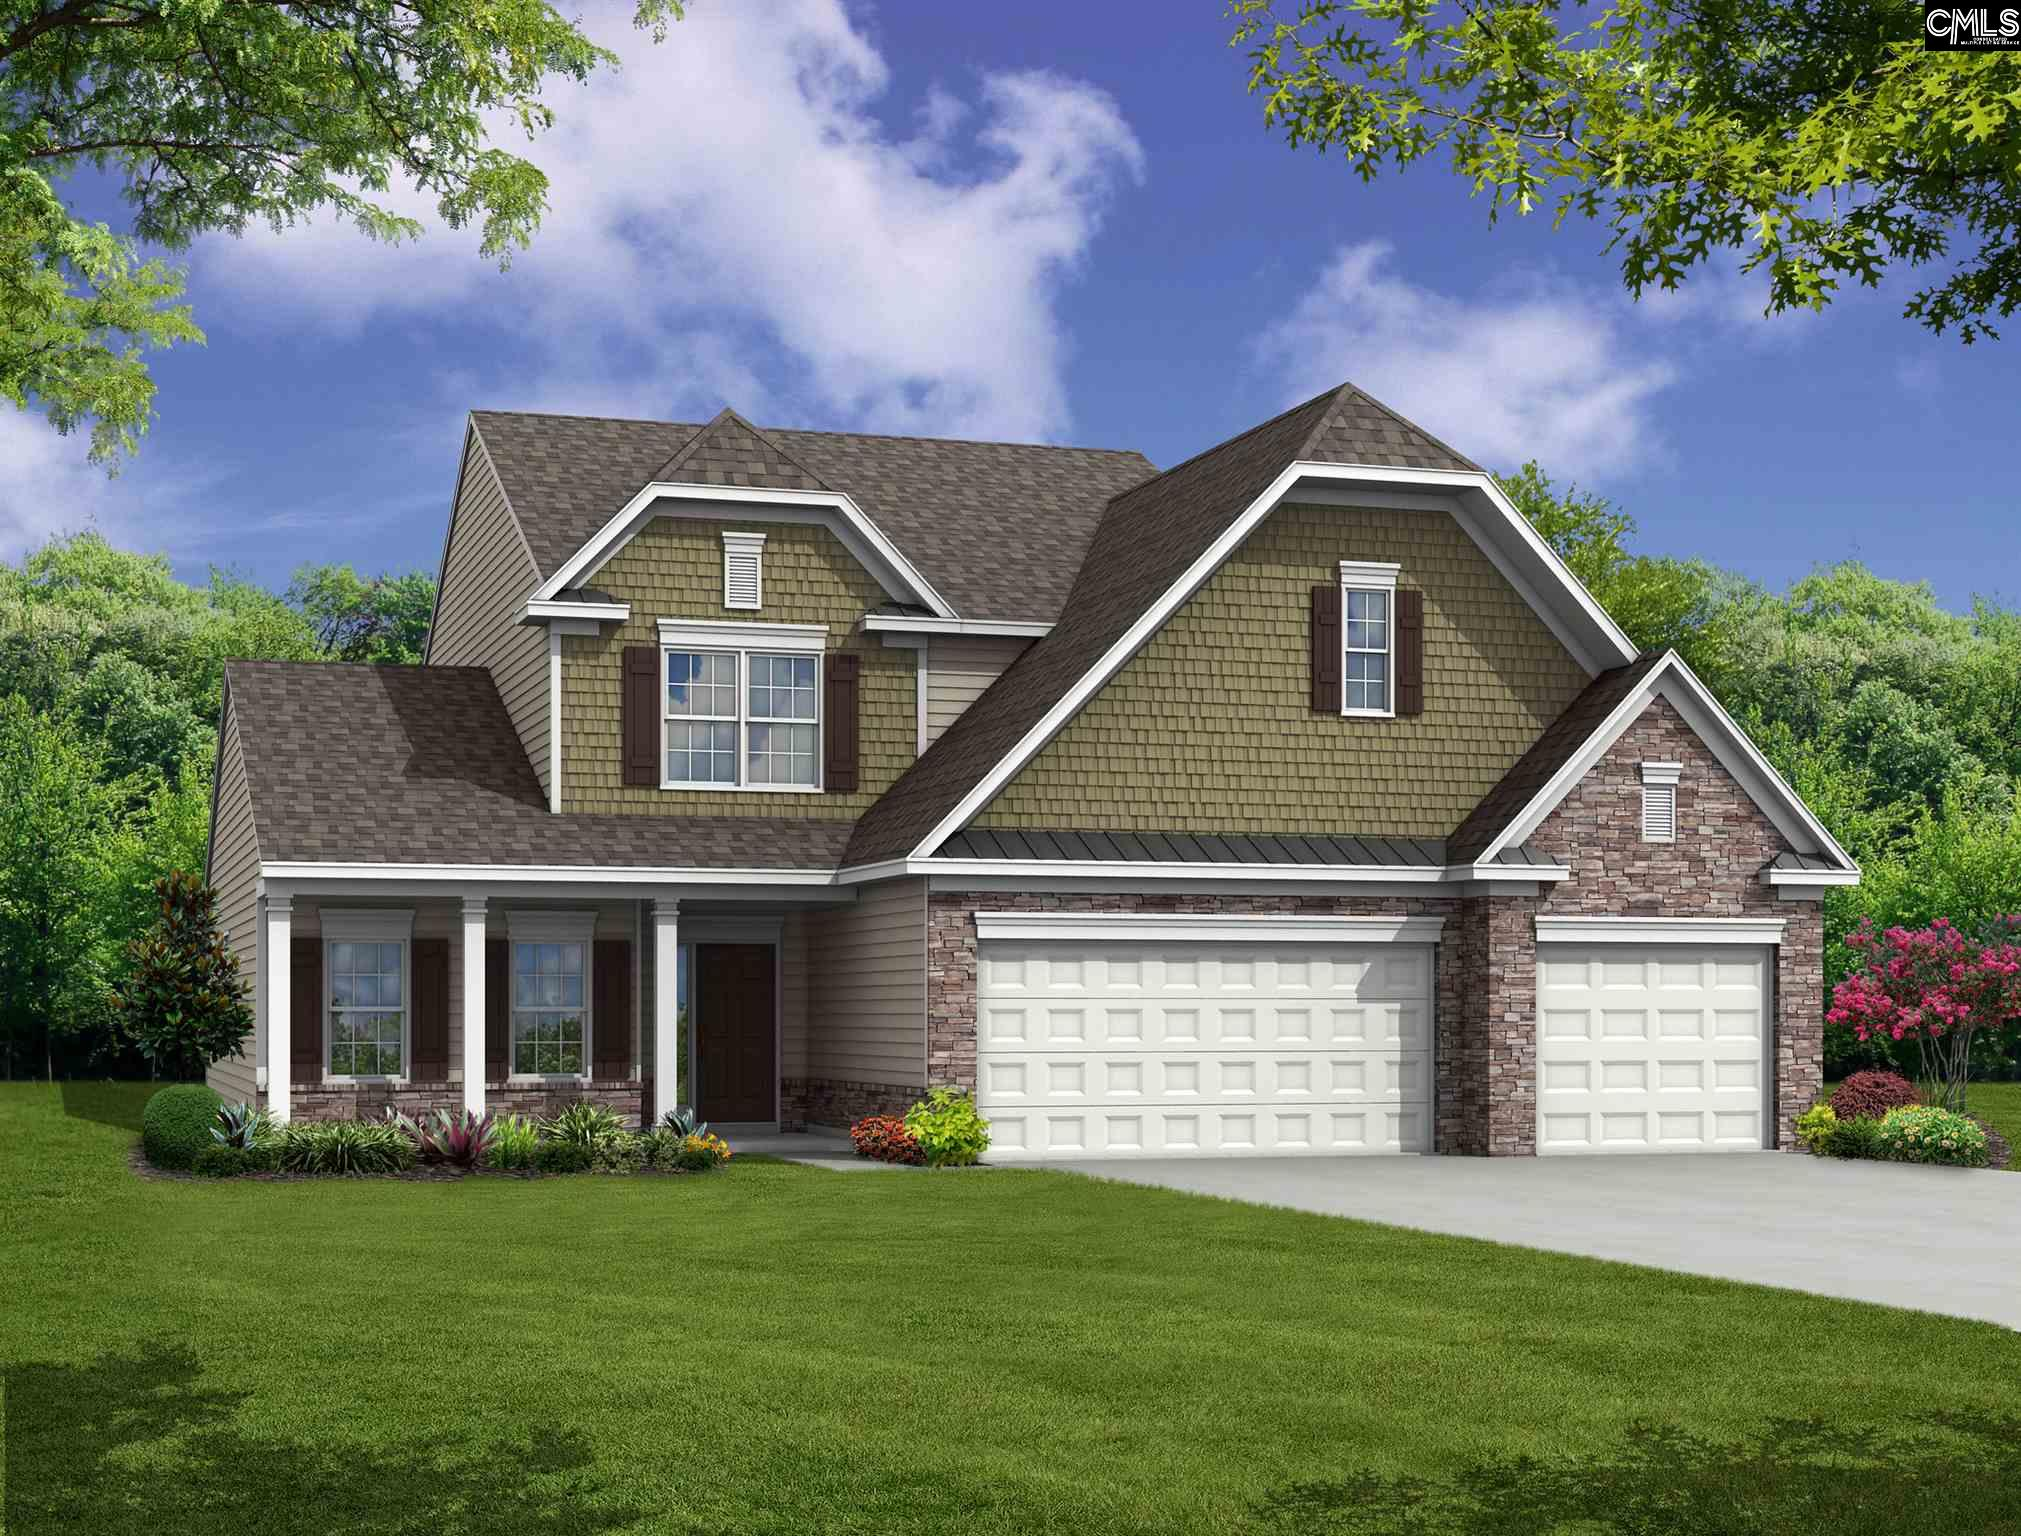 266 Glenn Village Blythewood, SC 29016